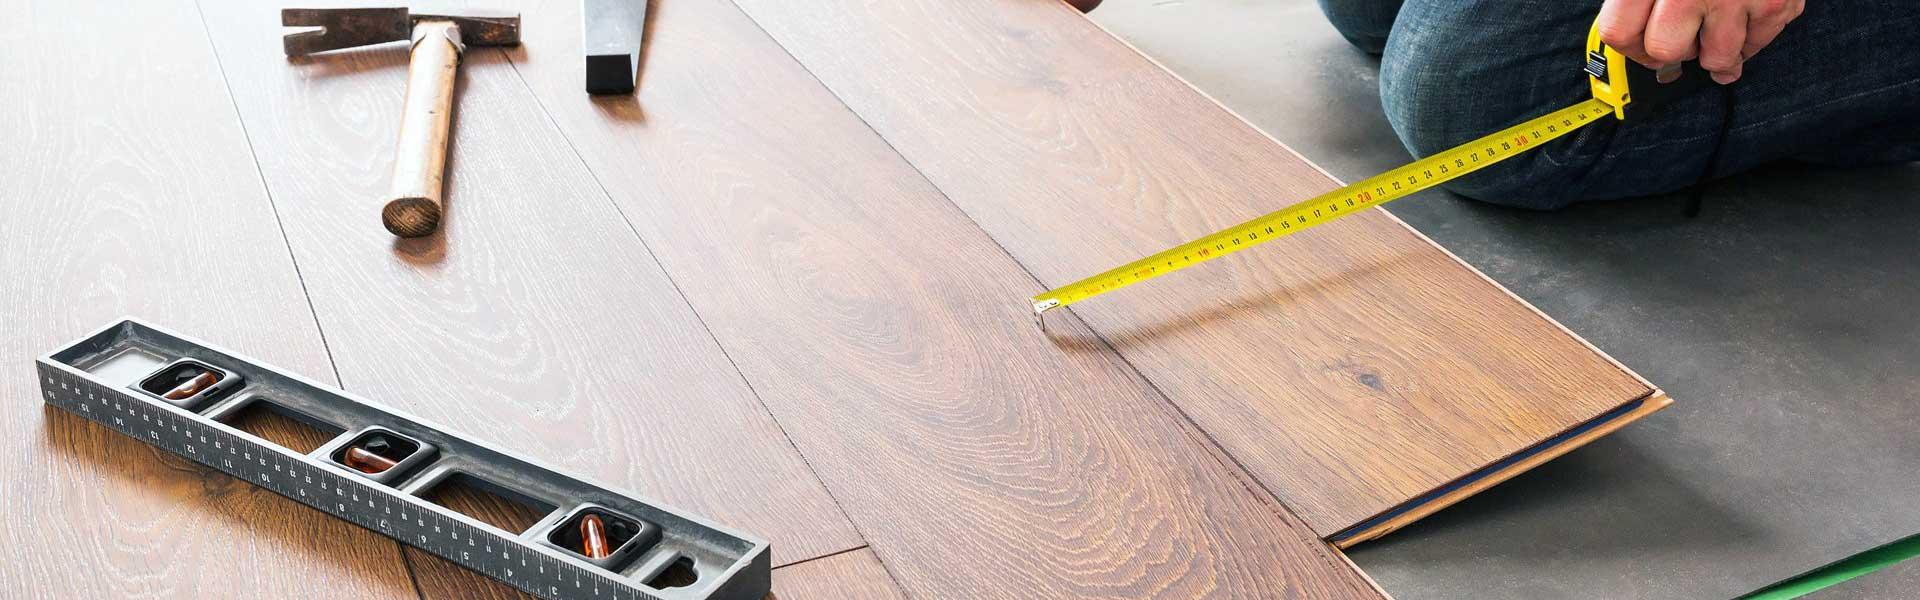 Floor Installation and Preparation